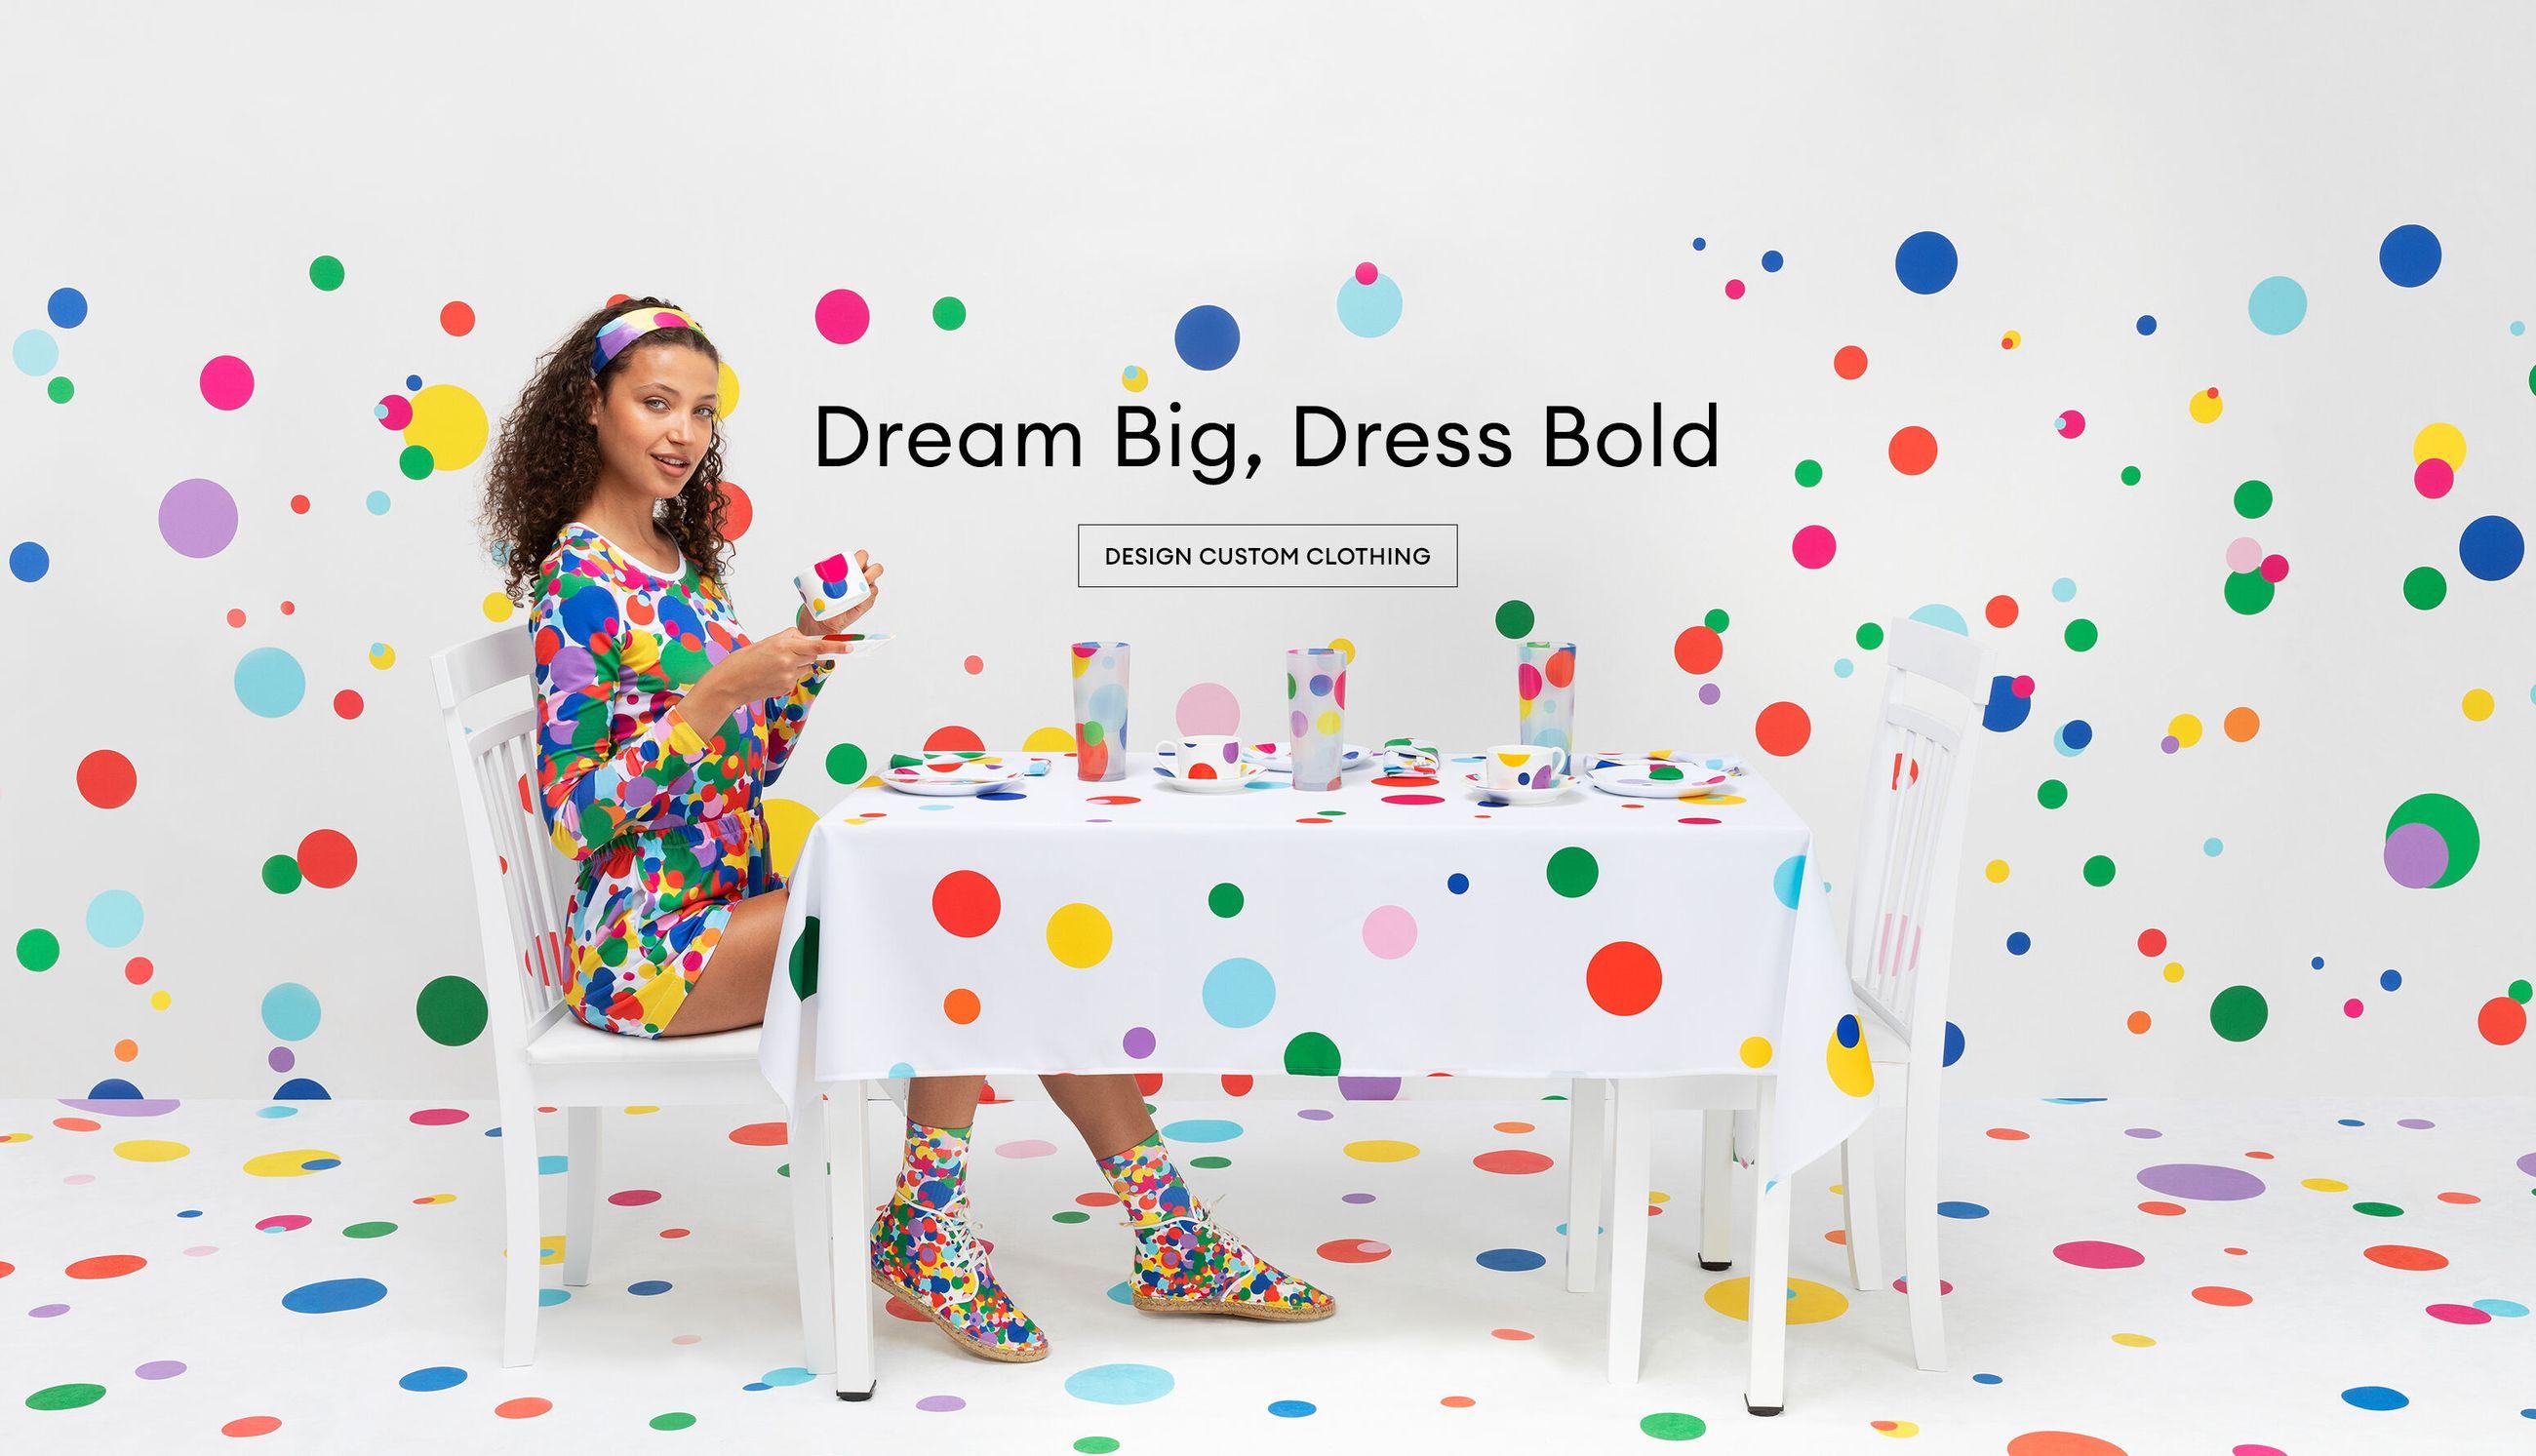 Design Custom Clothing